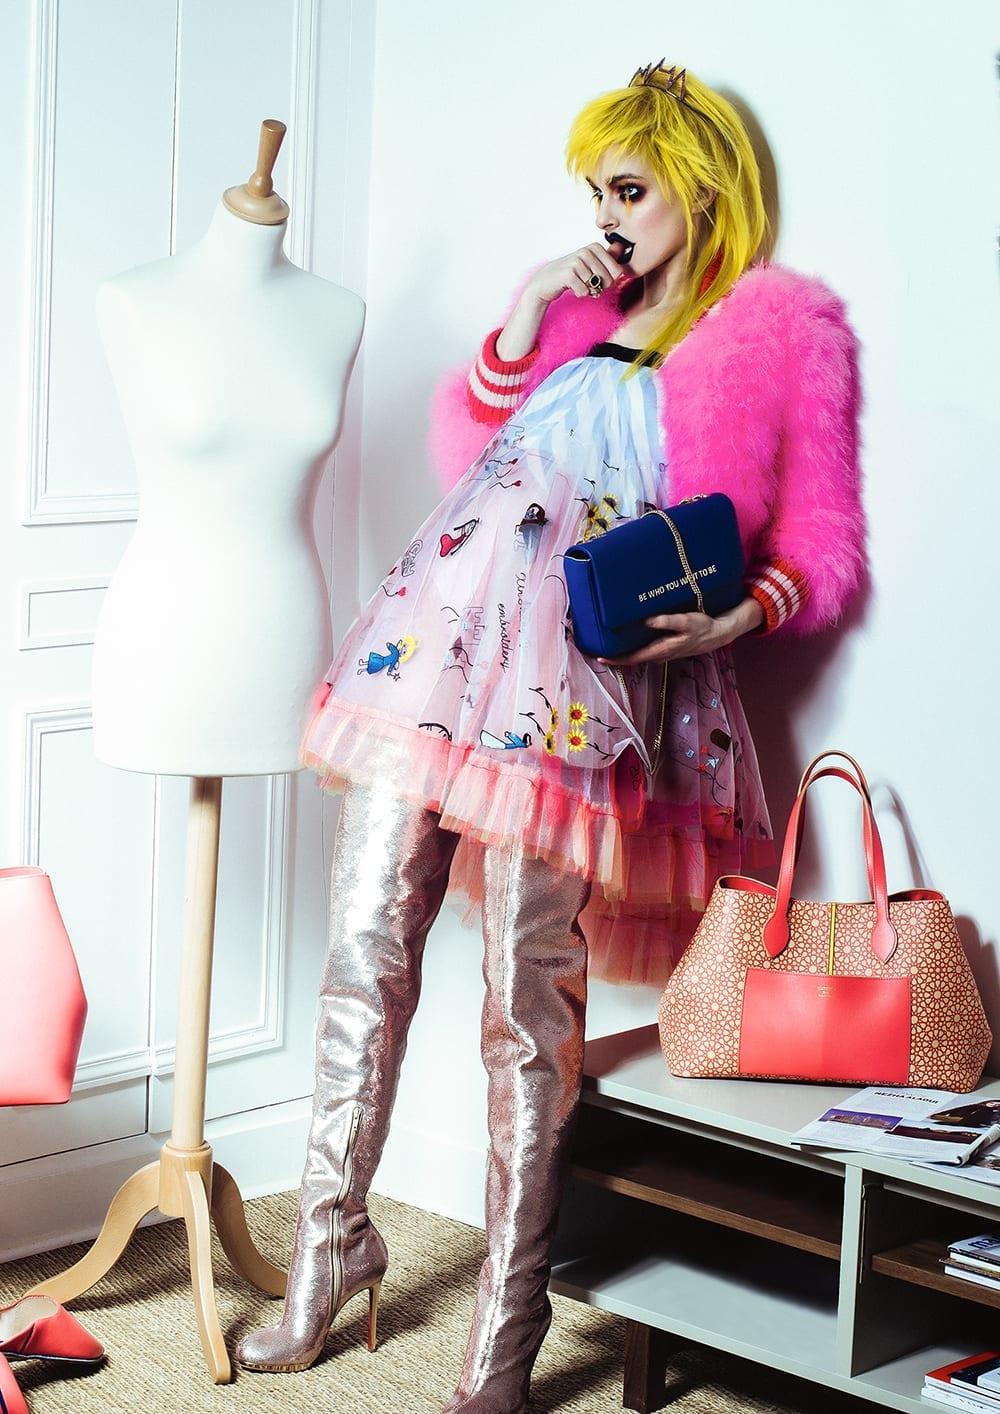 Fashion-Spider_LA_SERIE_N1_JUNKO-SHIMADA._MINIME-PARIS_ AMBER-SAKAI_OLE-LYNGGAARD-COPENHAGEN_MAISON-MAYSHAD-PARIS_CHRISTIAN-LOUBOUTIN